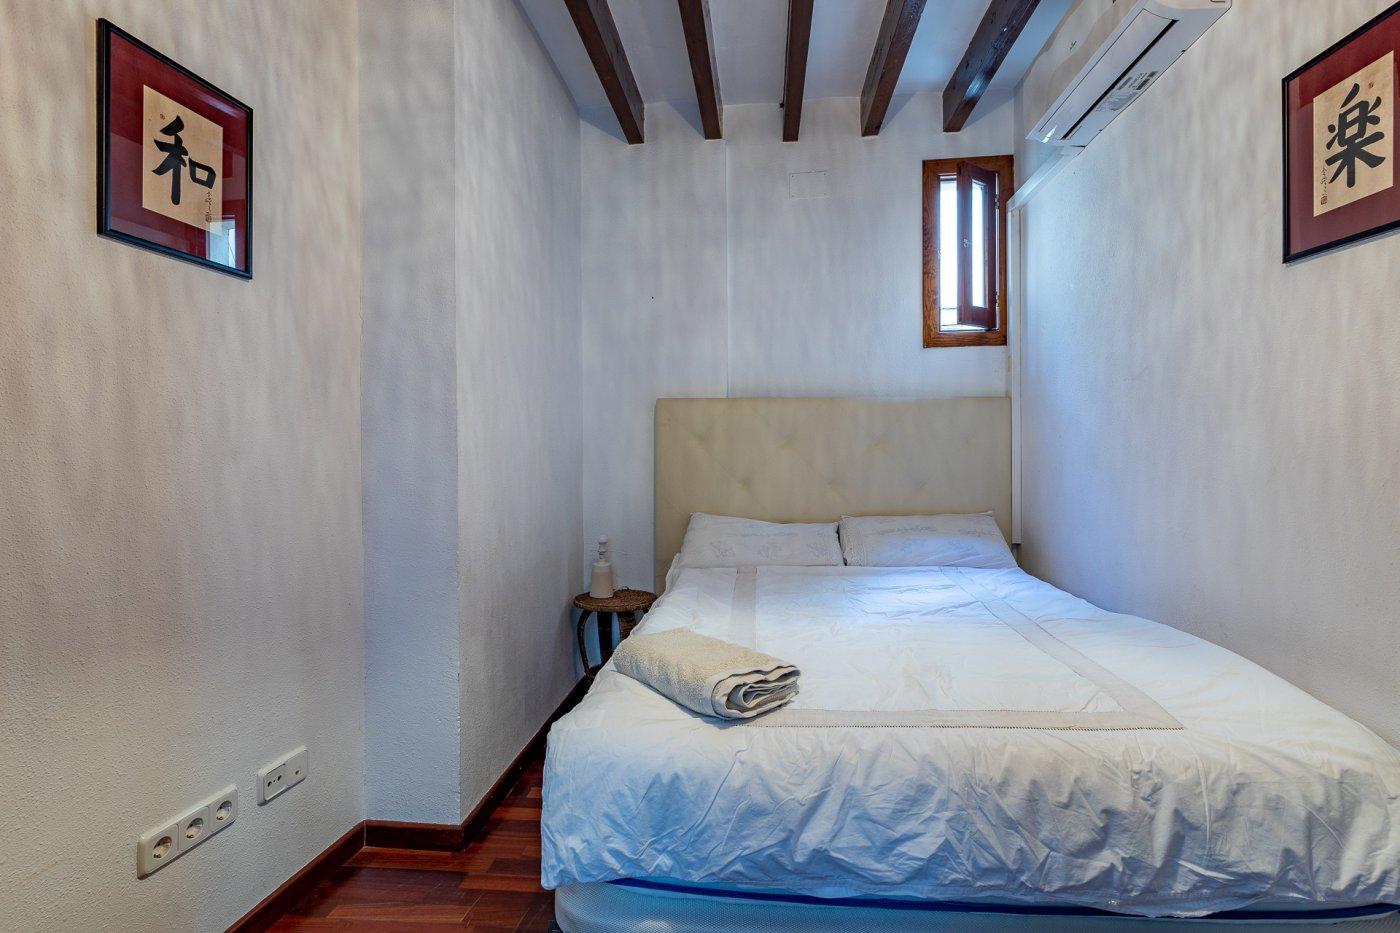 Espectacular apartamento en centro de palma - imagenInmueble17